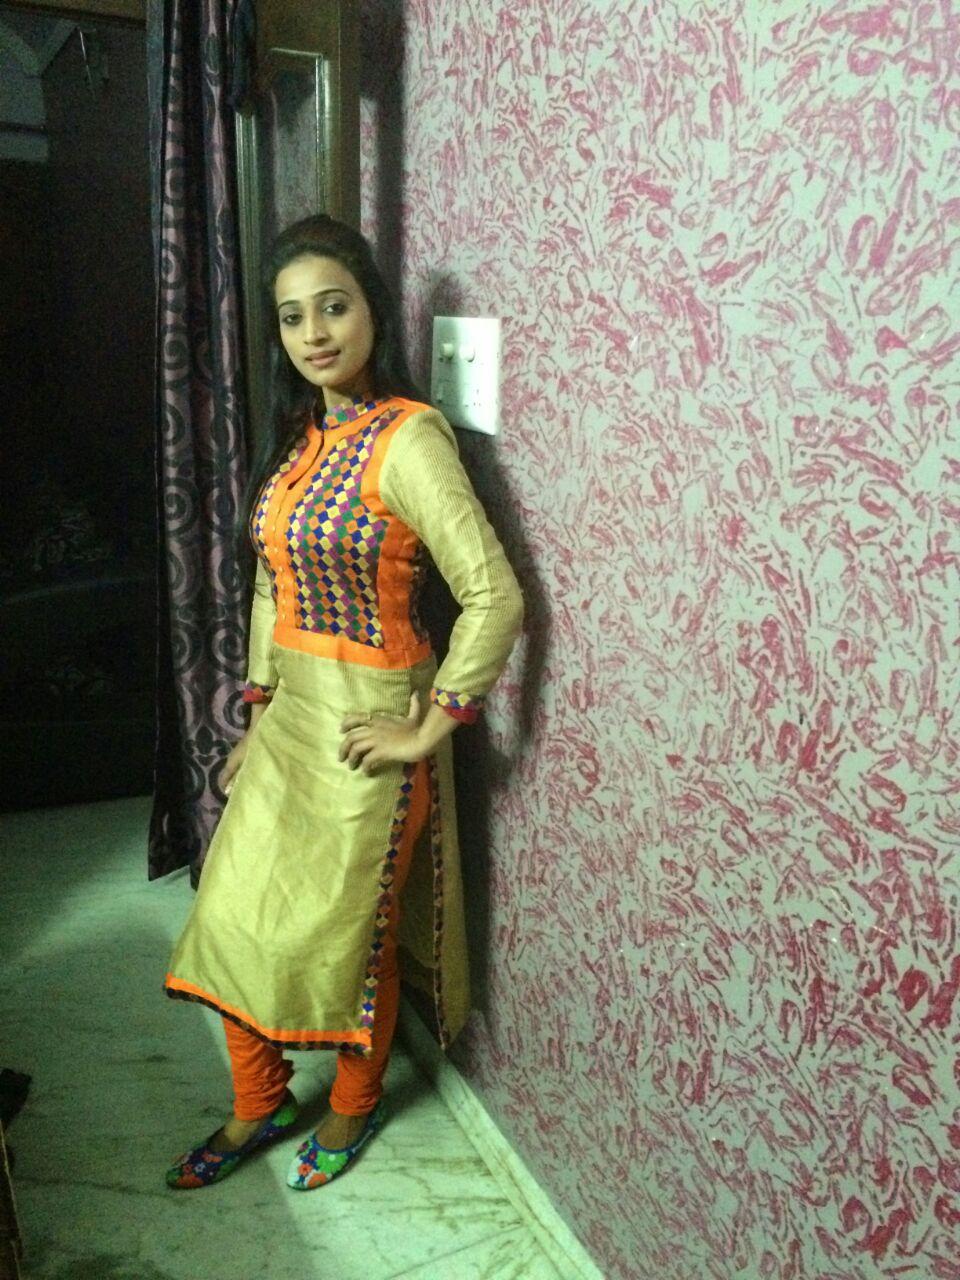 Gurpreet Kaur